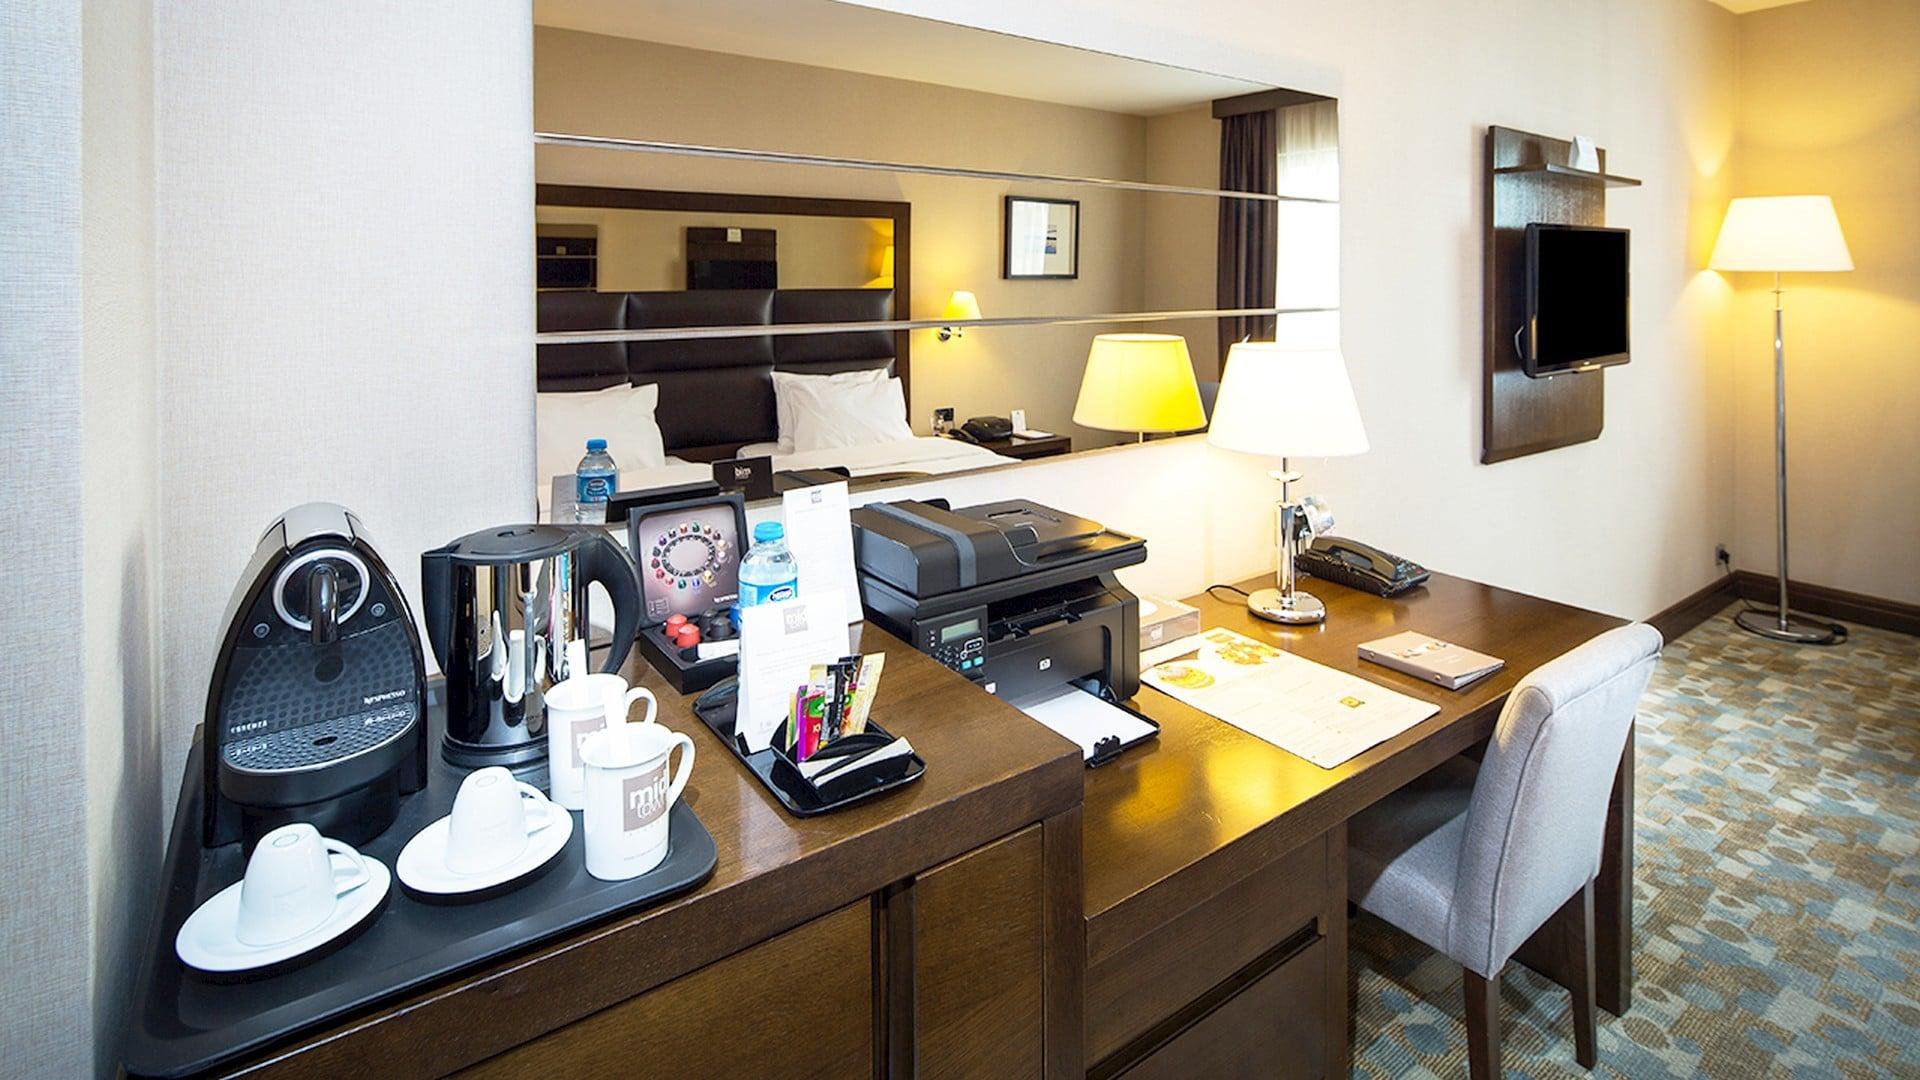 Midtown Hotel Room İnterior